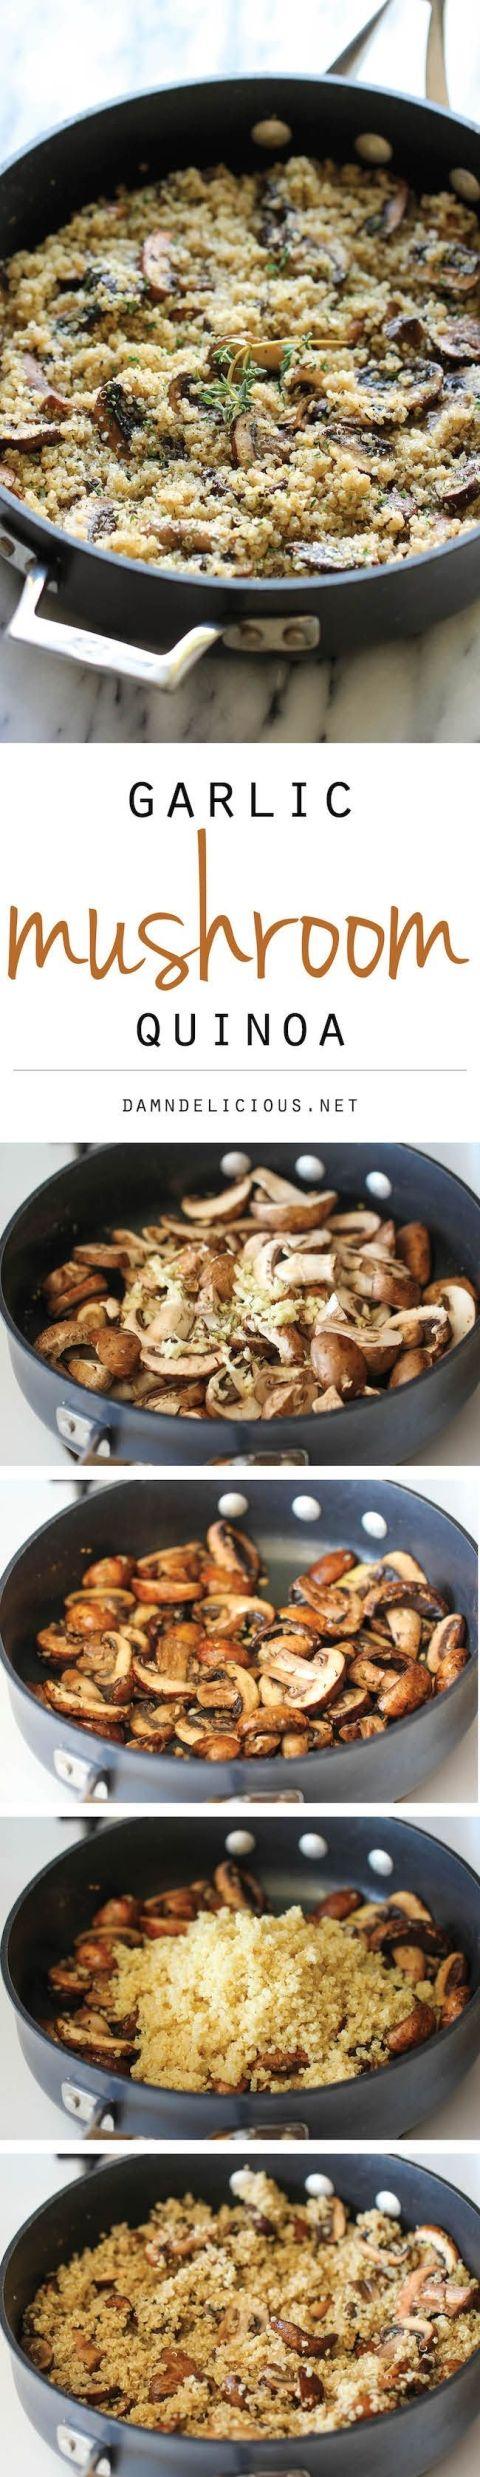 Garlic Mushroom Quinoa Recipe